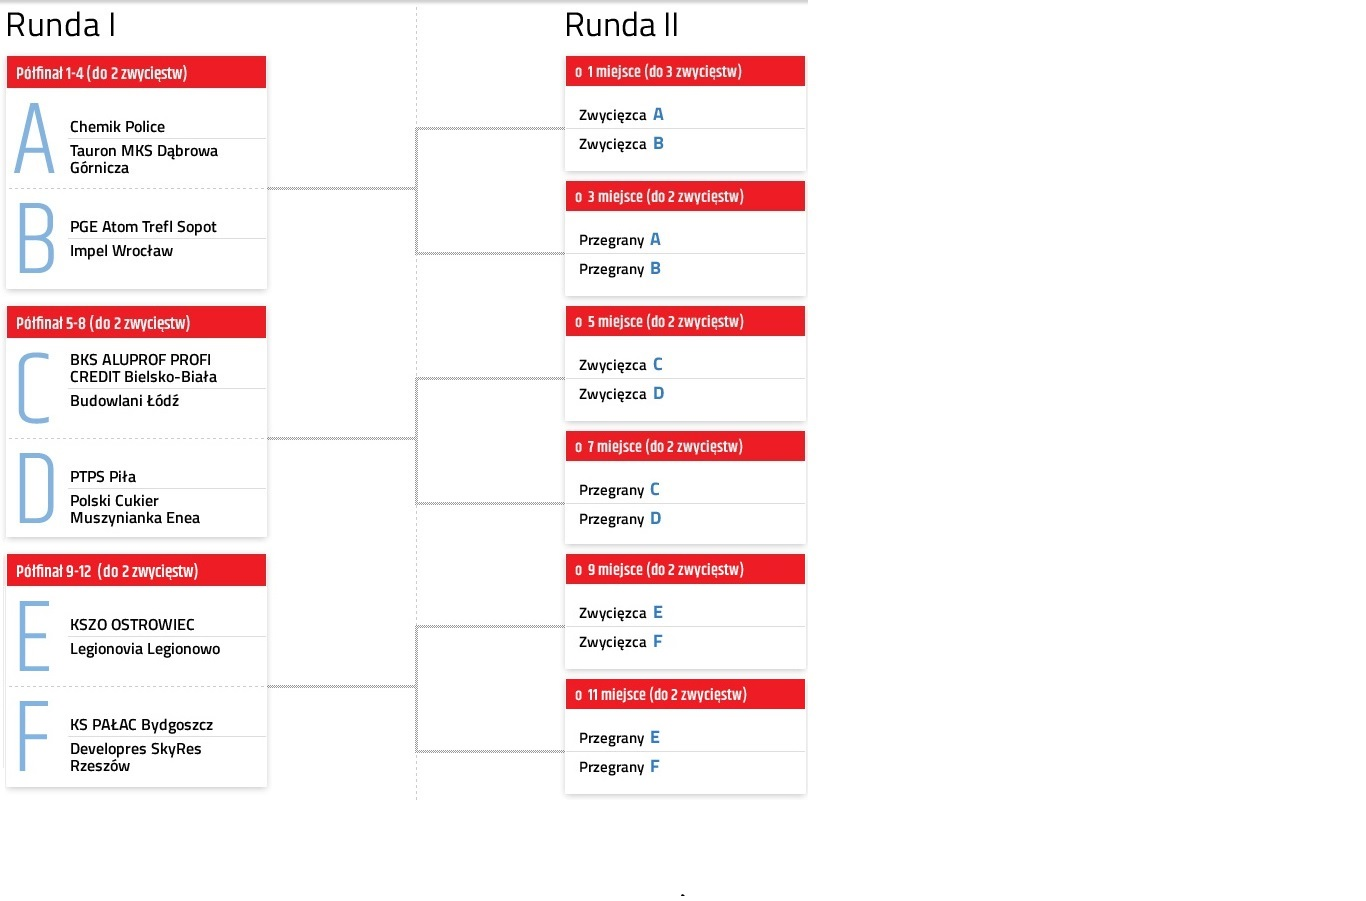 faza play-off ORLEN Liga